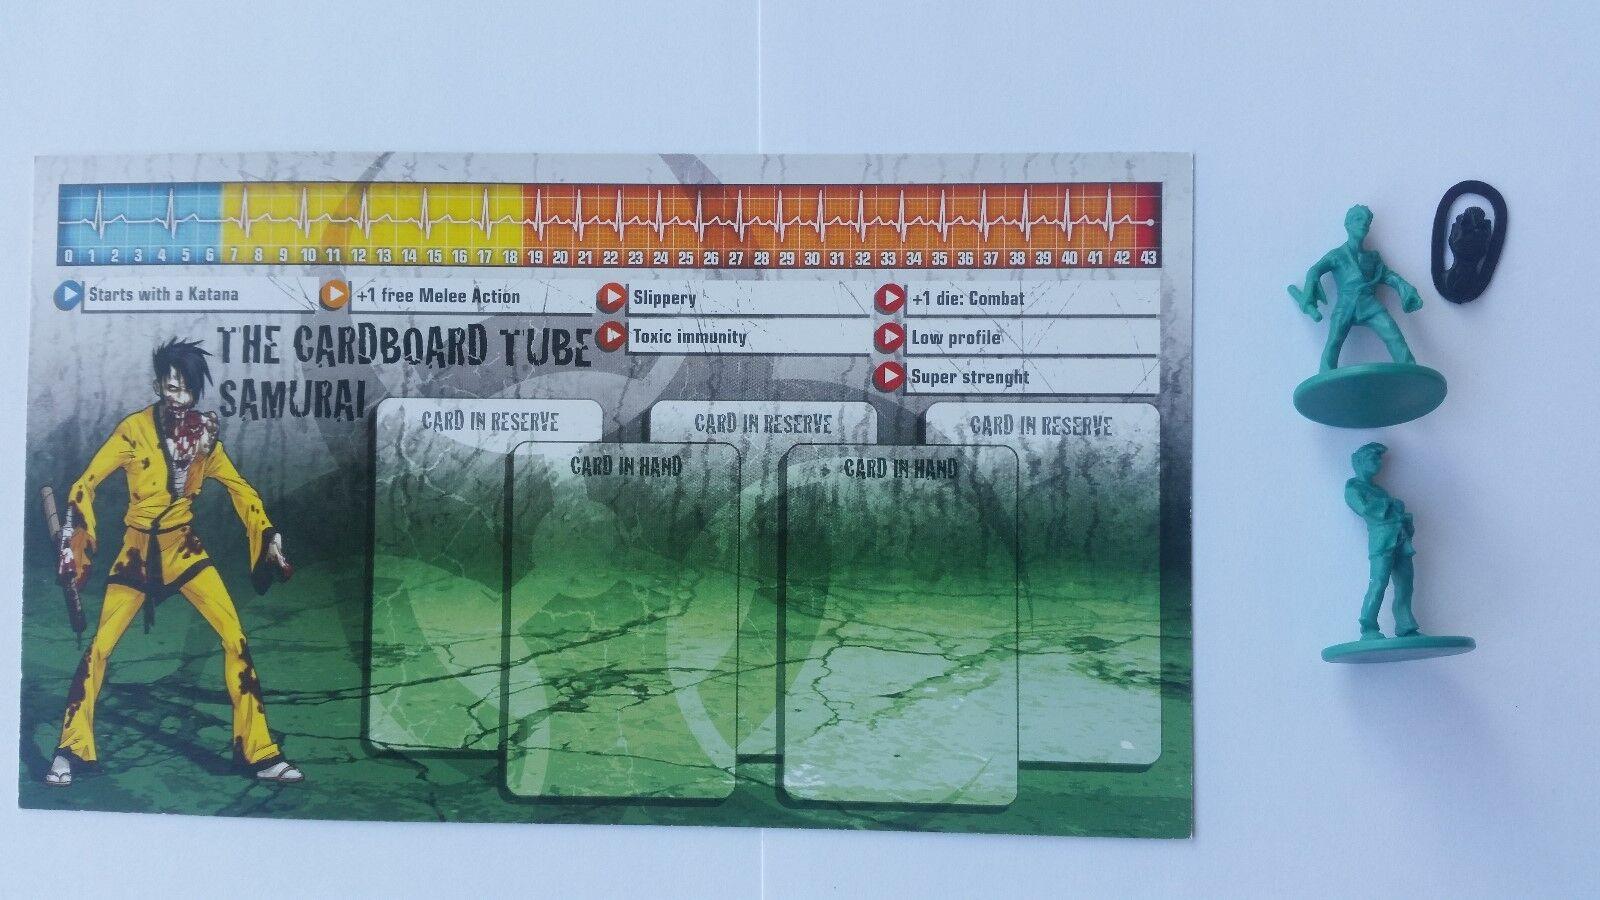 ZOMBICIDE PROMO SEASON 1 CARDBOARD TUBE SAMURAI, A ESTRENAR    NEW